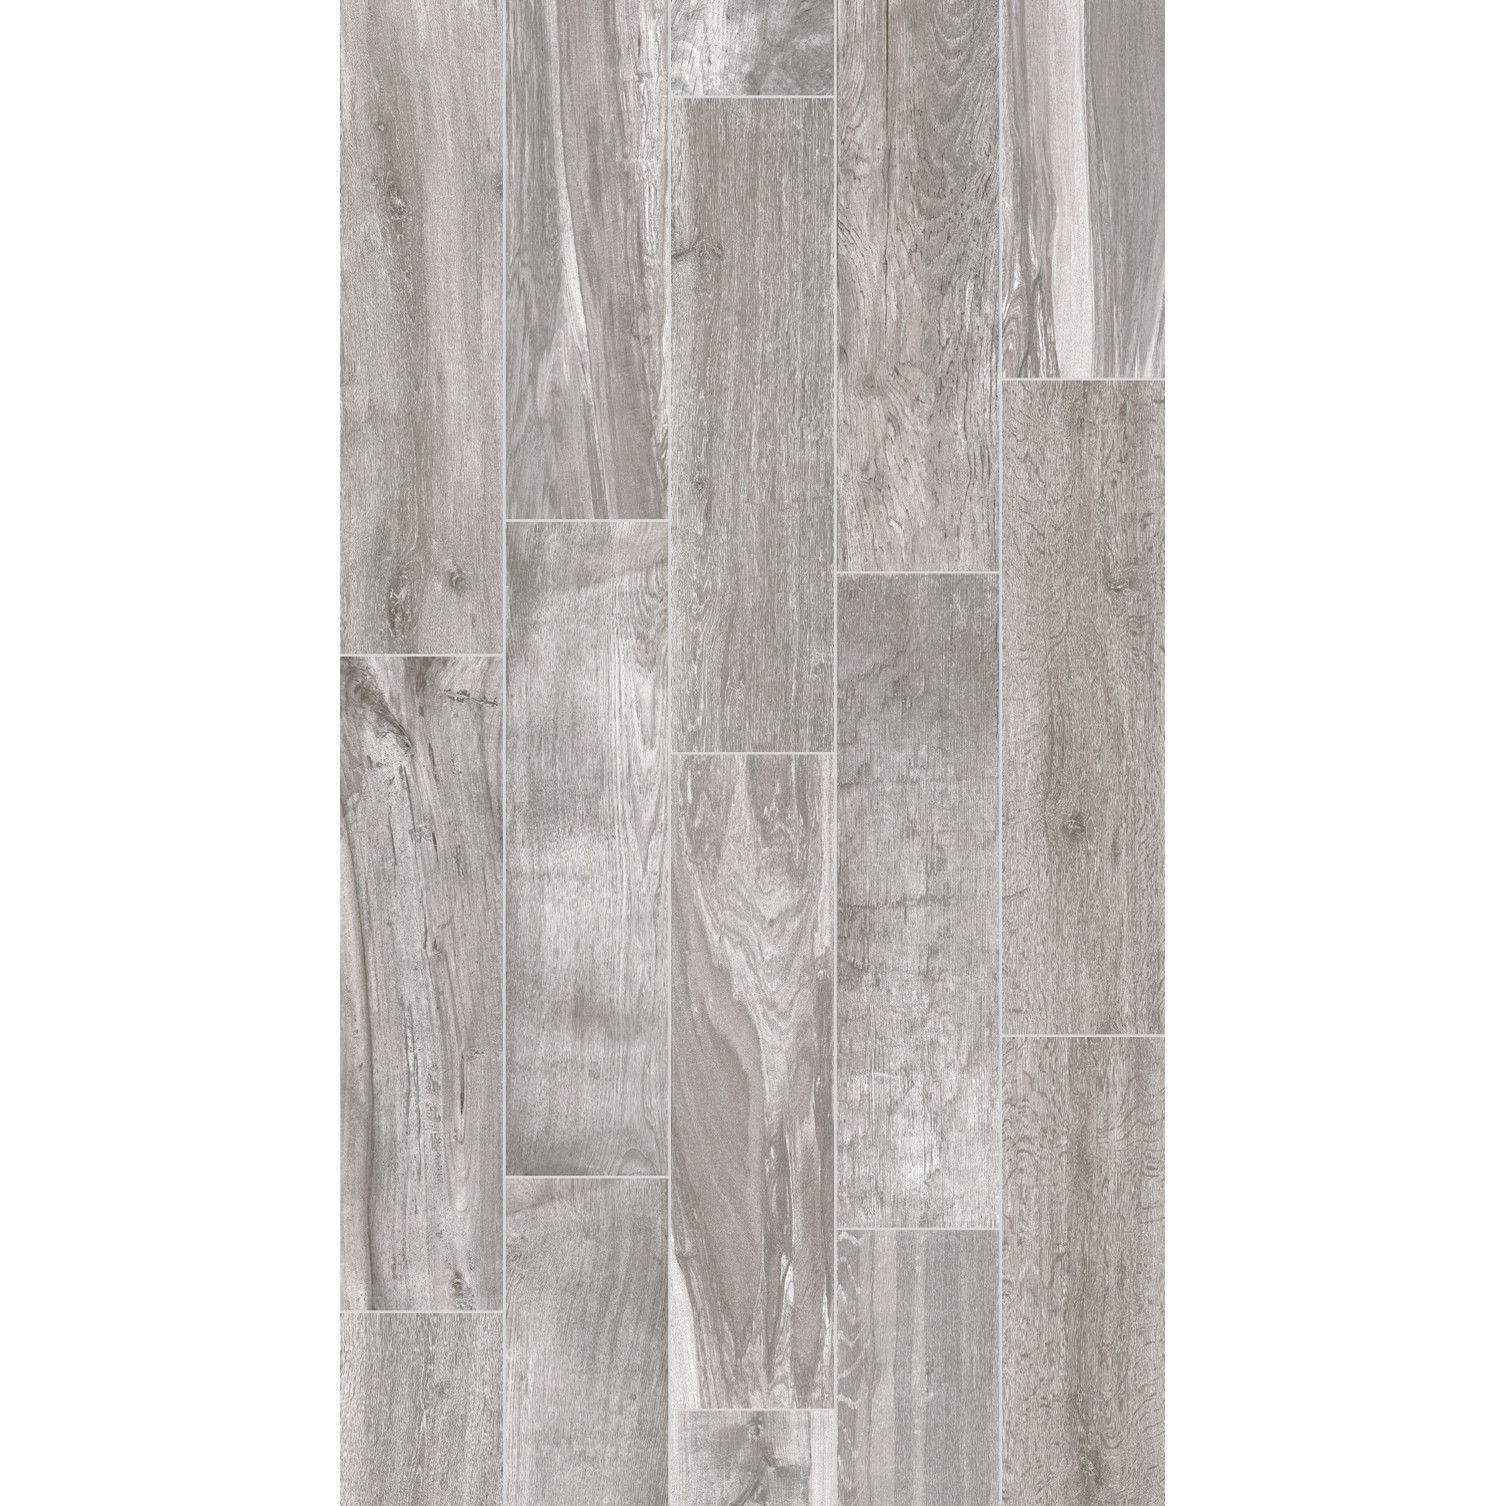 Shuffle 6 x 24 porcelain wood tile in ash porcelain wood tile parvatile shuffle 6 x 24 porcelain wood tile dailygadgetfo Images